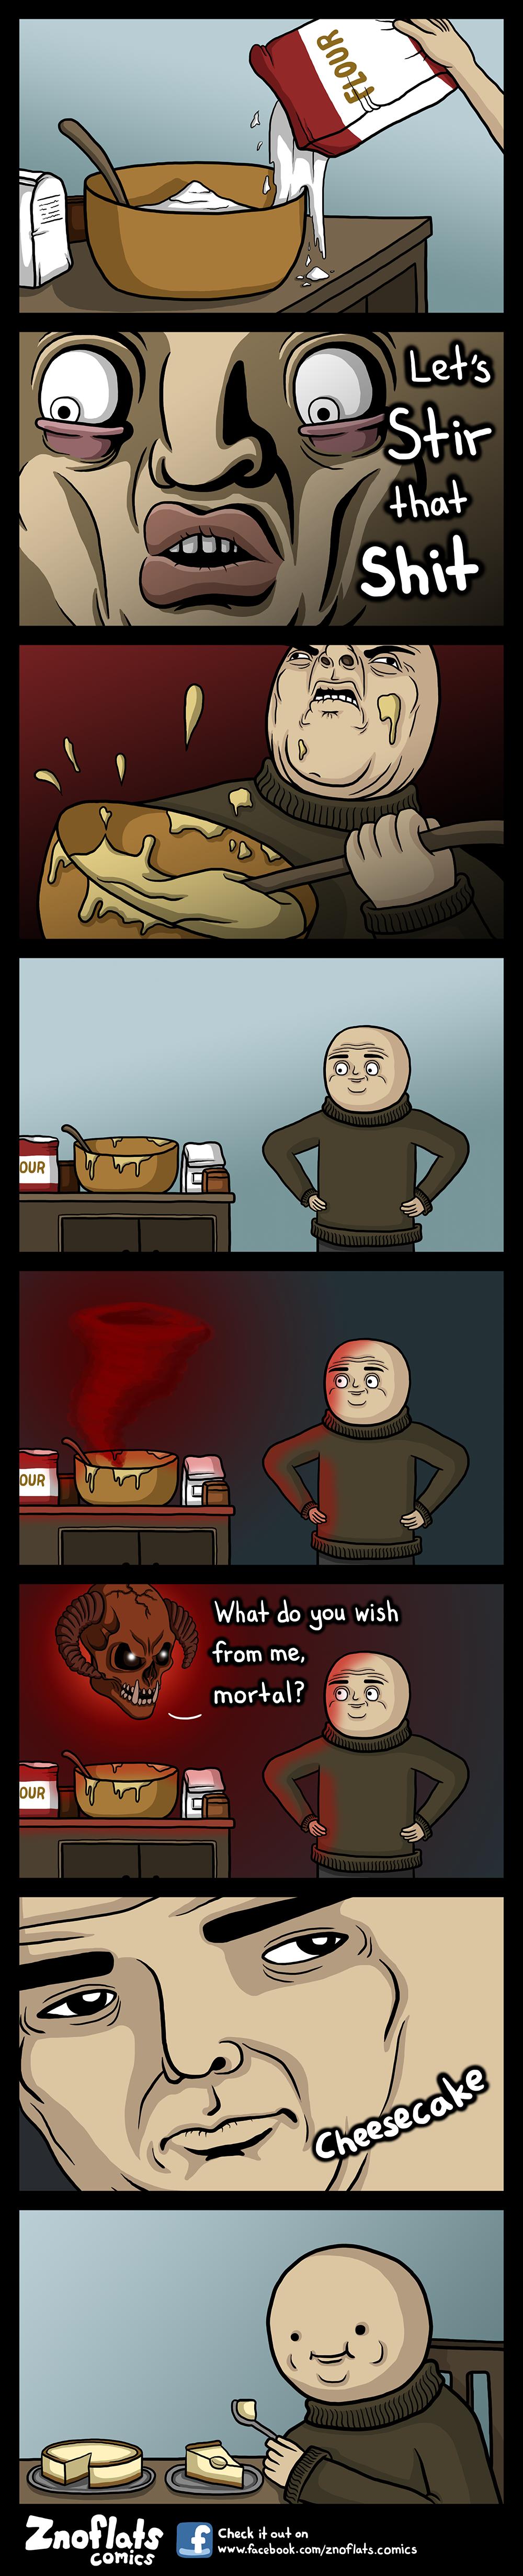 Hur man lagar en makalös ostkaka!. For all of my comics: www.facebook.com/Znoflats.Comics?ref=hl.. For those uses of cheesecake